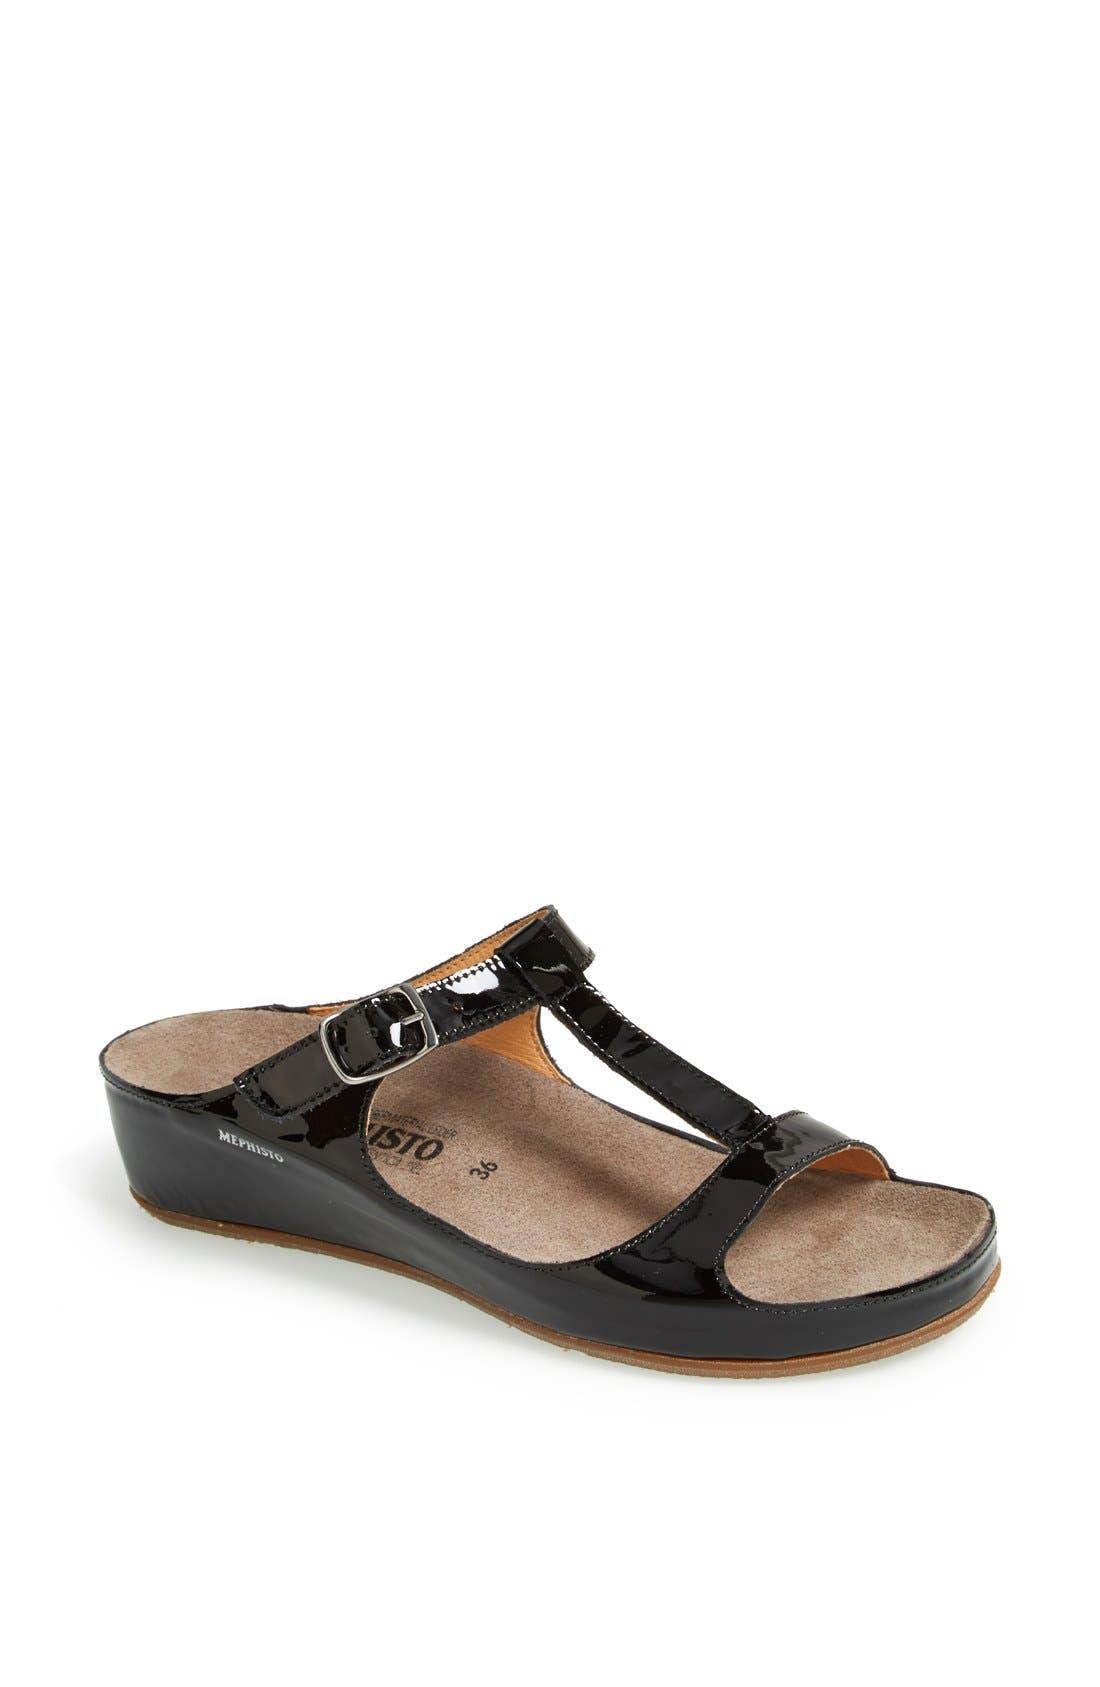 Main Image - Mephisto 'Valena' Sandal